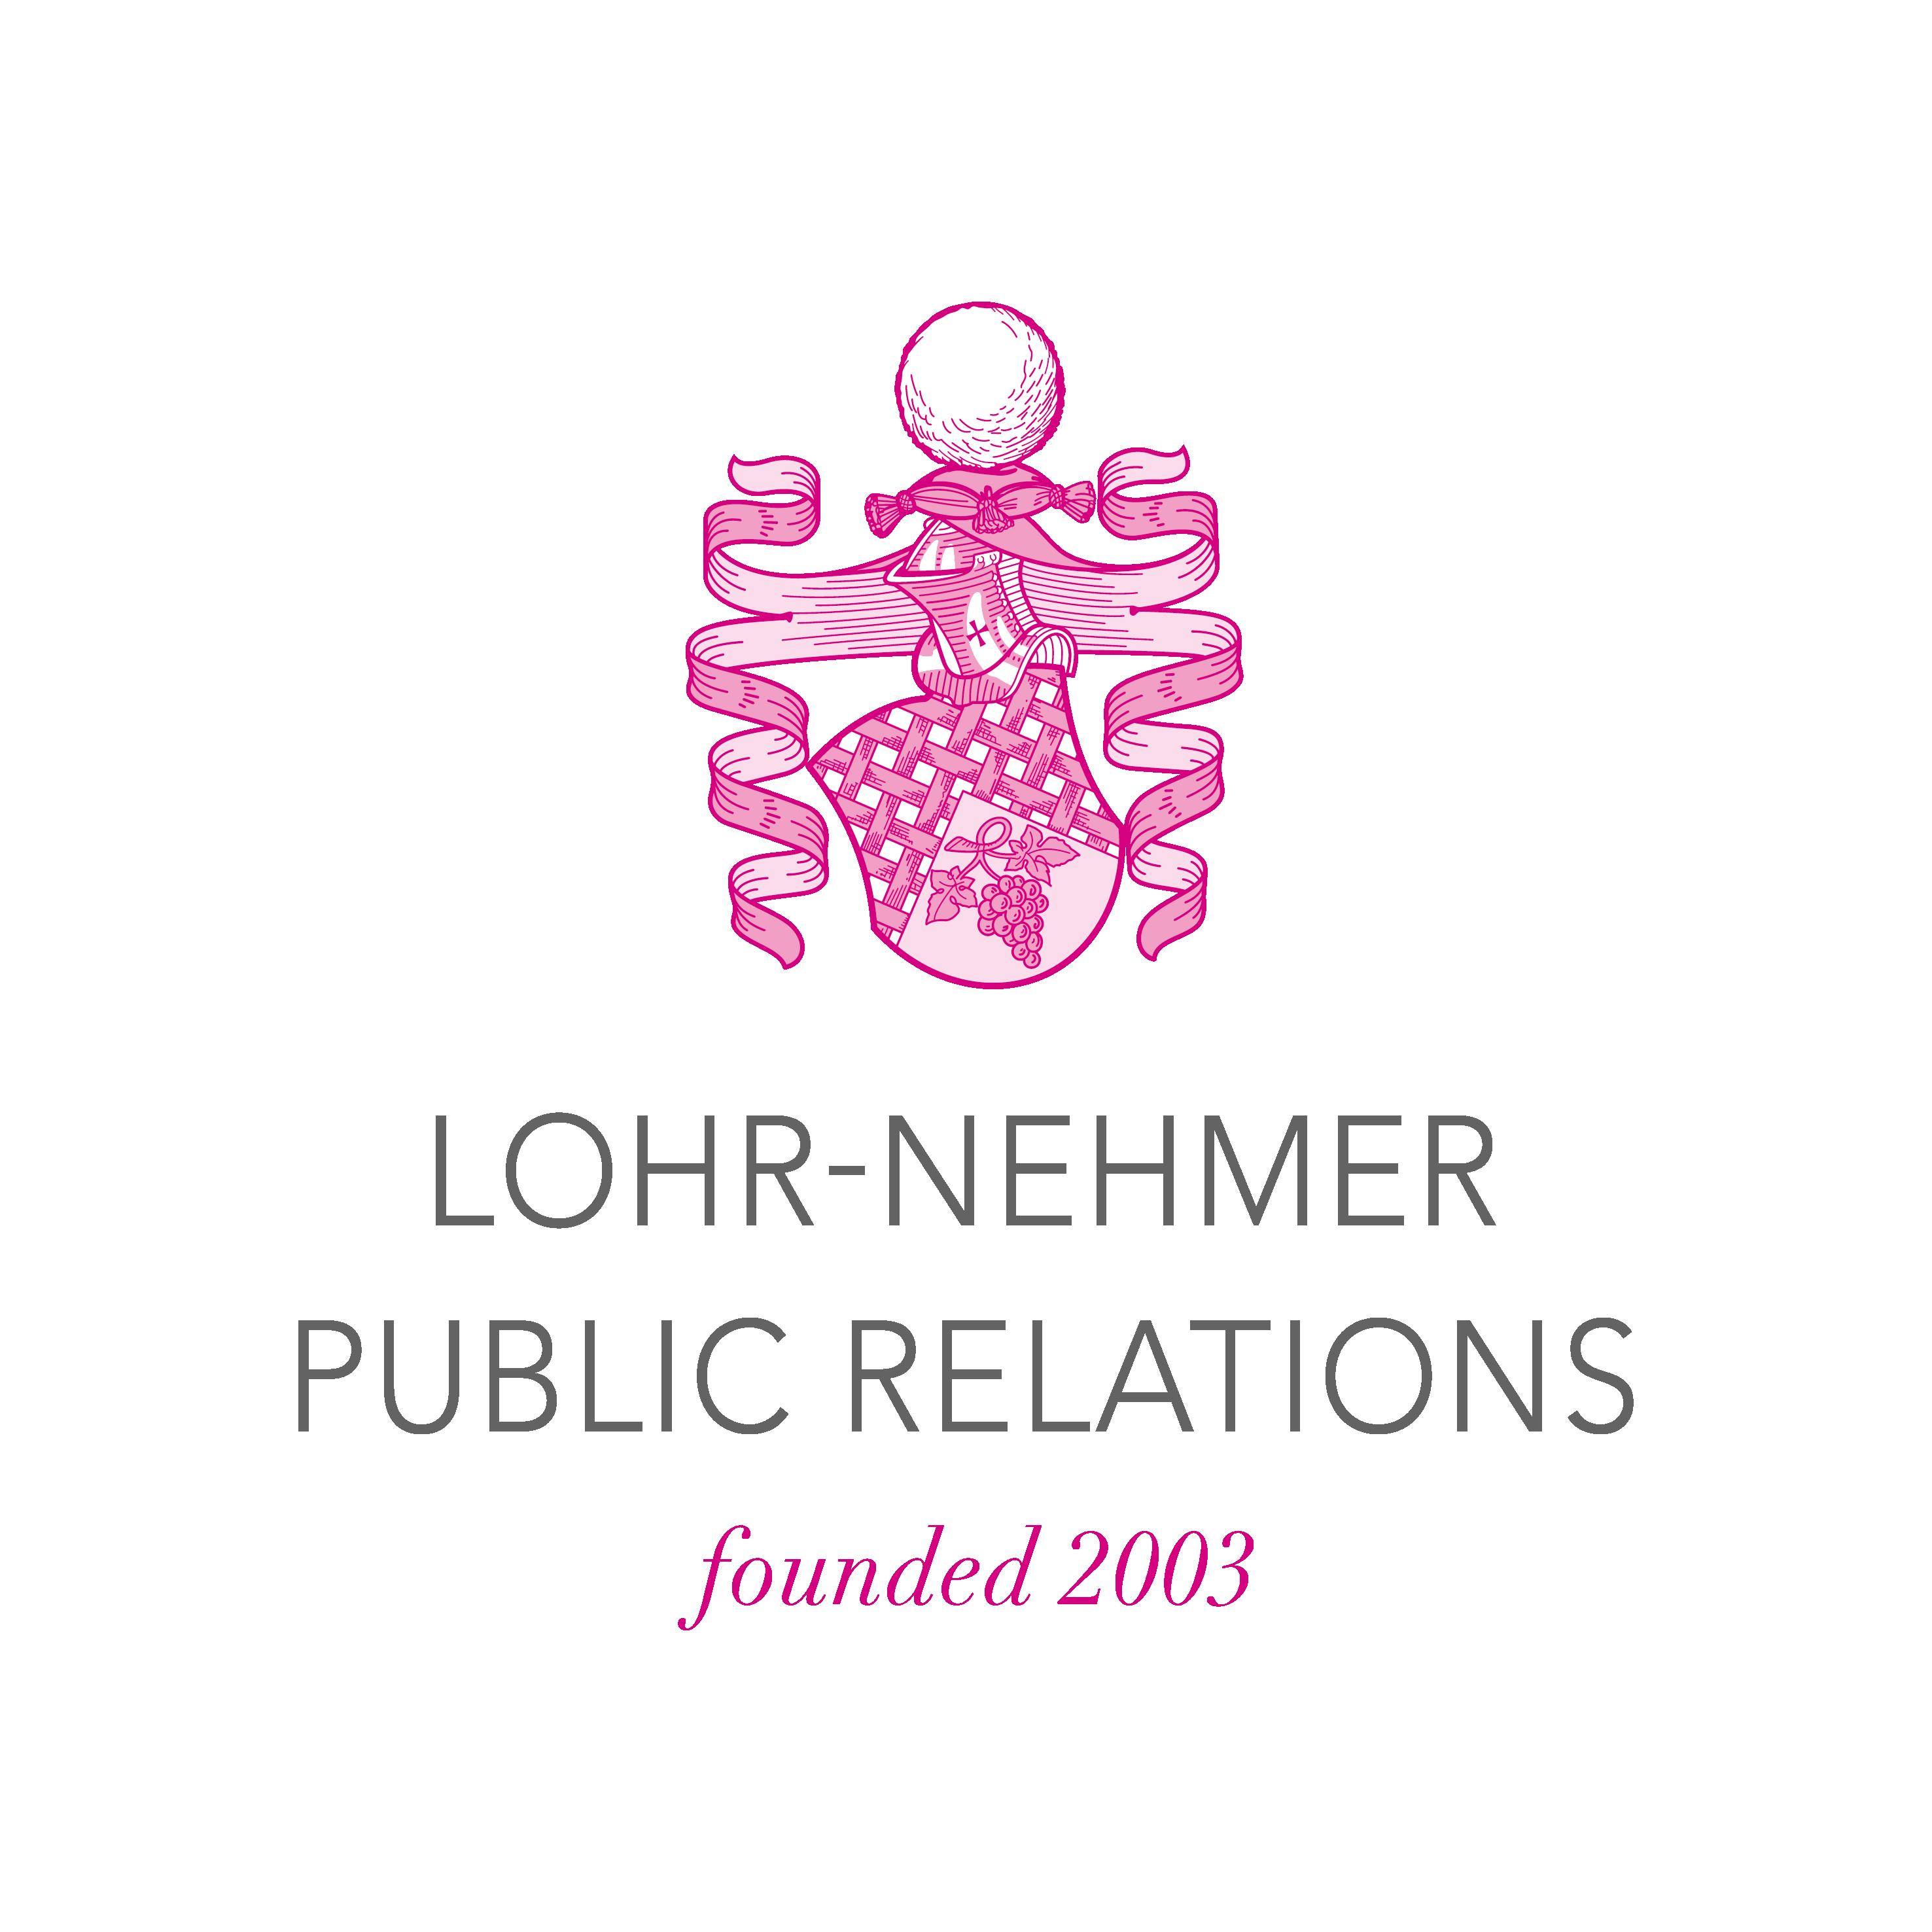 Lohr-Nehmer Public Relations